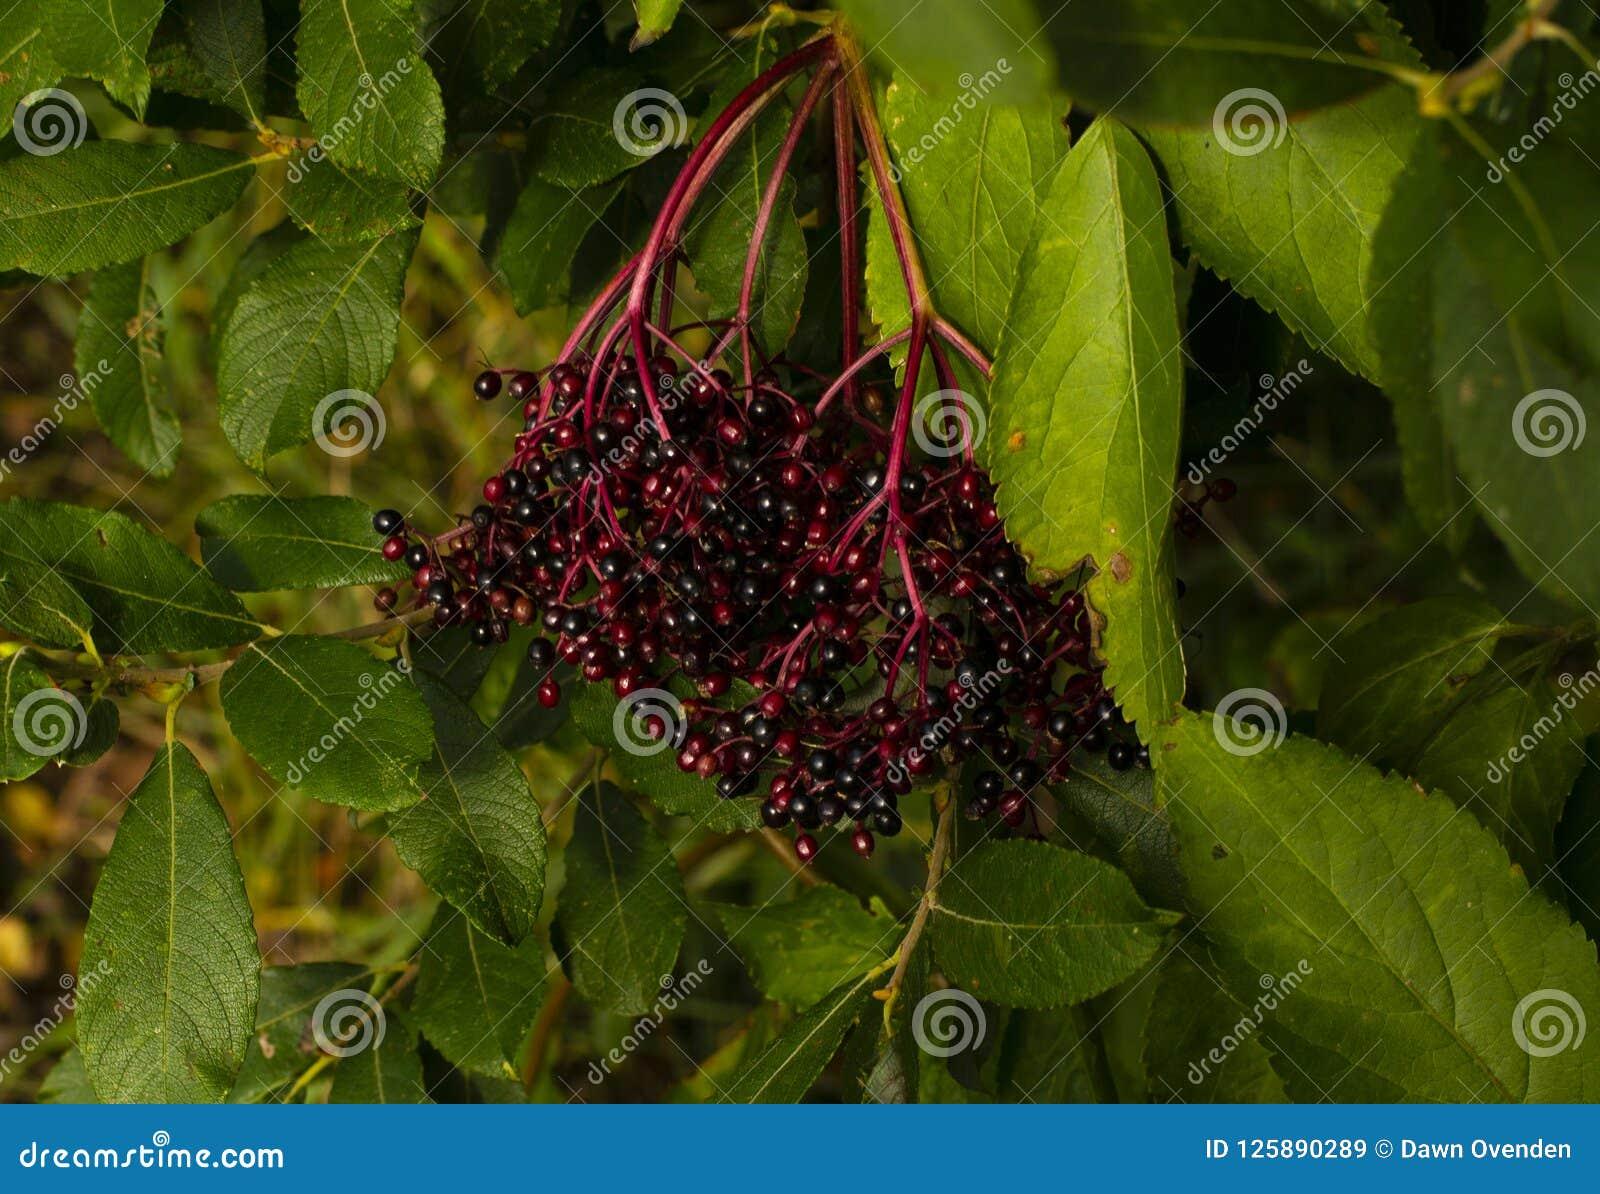 Profundo - bagas roxas e folhas verdes vibrantes